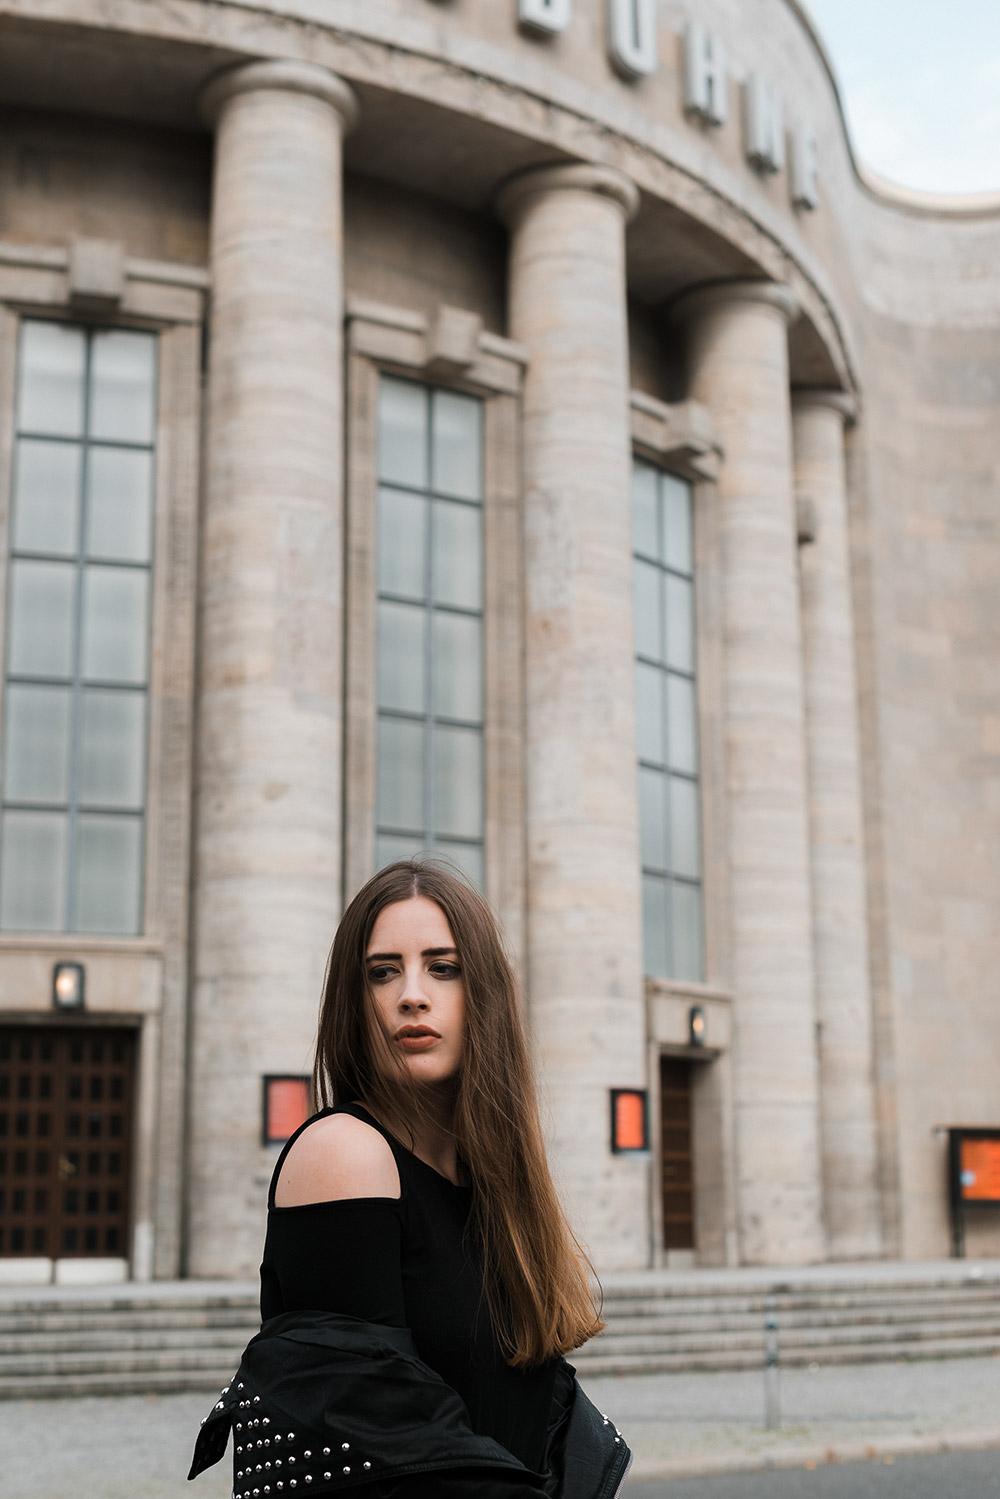 andysparkles-Modeblog Berlin-Lederjacke mit Nieten